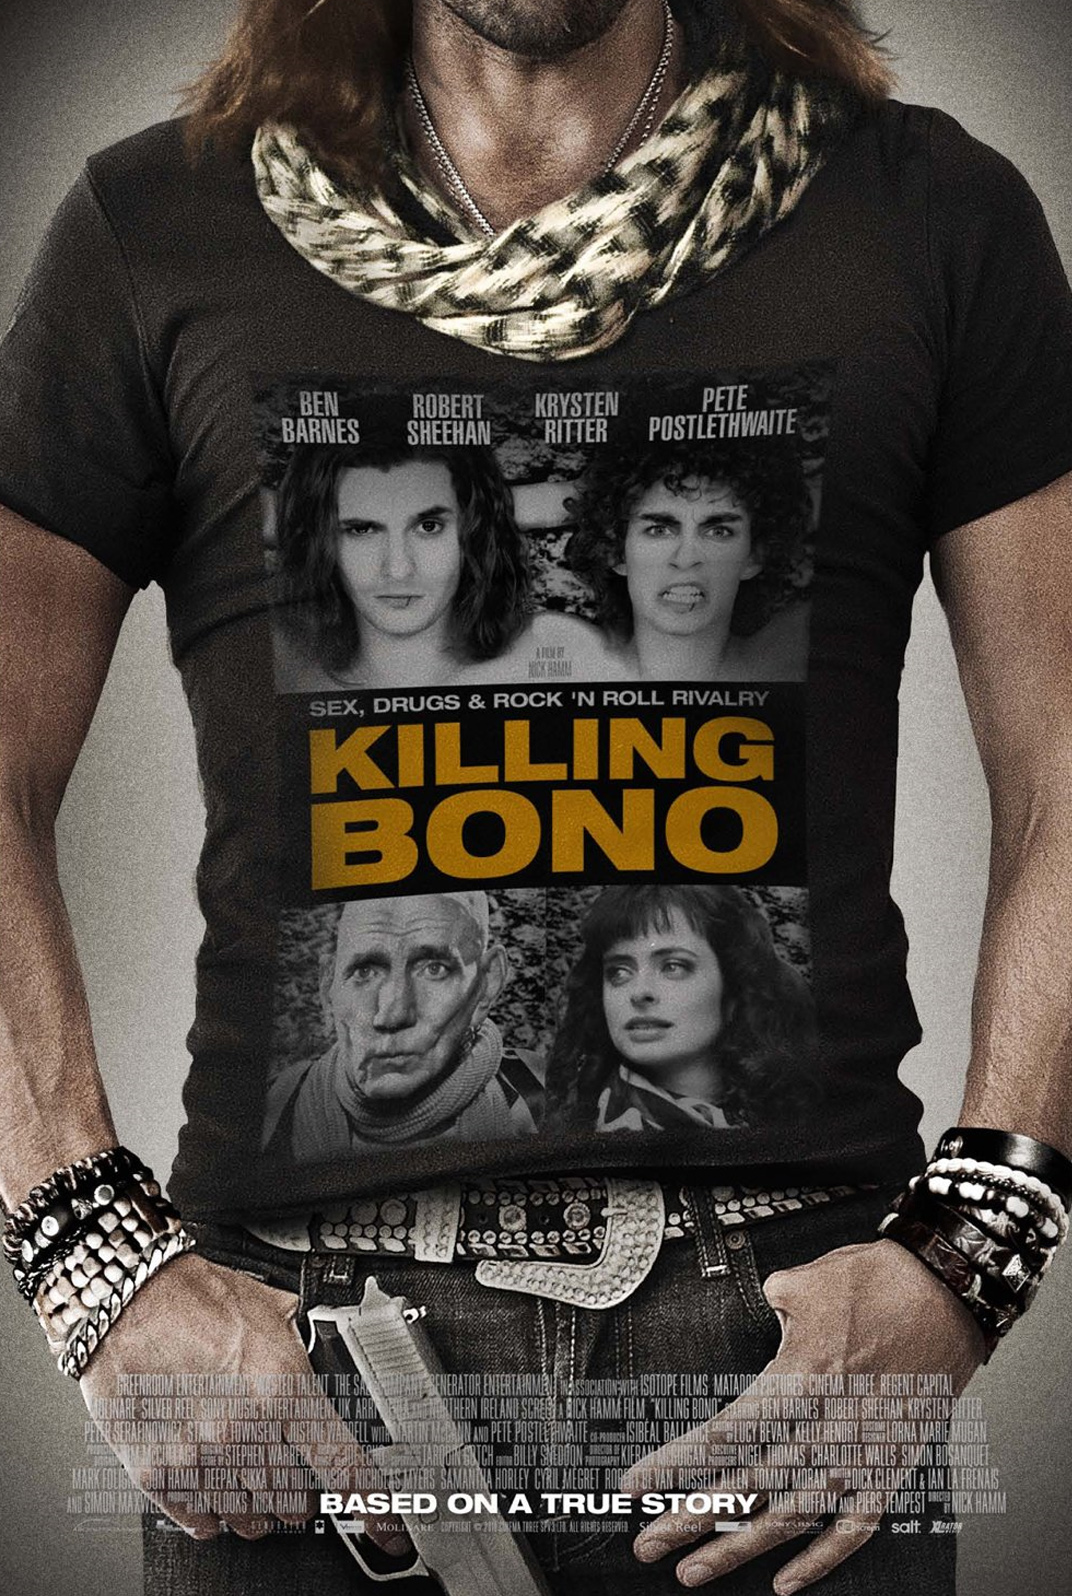 http://4.bp.blogspot.com/-mkCb3Y3DyLo/TpCRLoWrXjI/AAAAAAAAE6s/f2wnTAYVcso/s1600/killing-bono-movie-poster-1.jpg